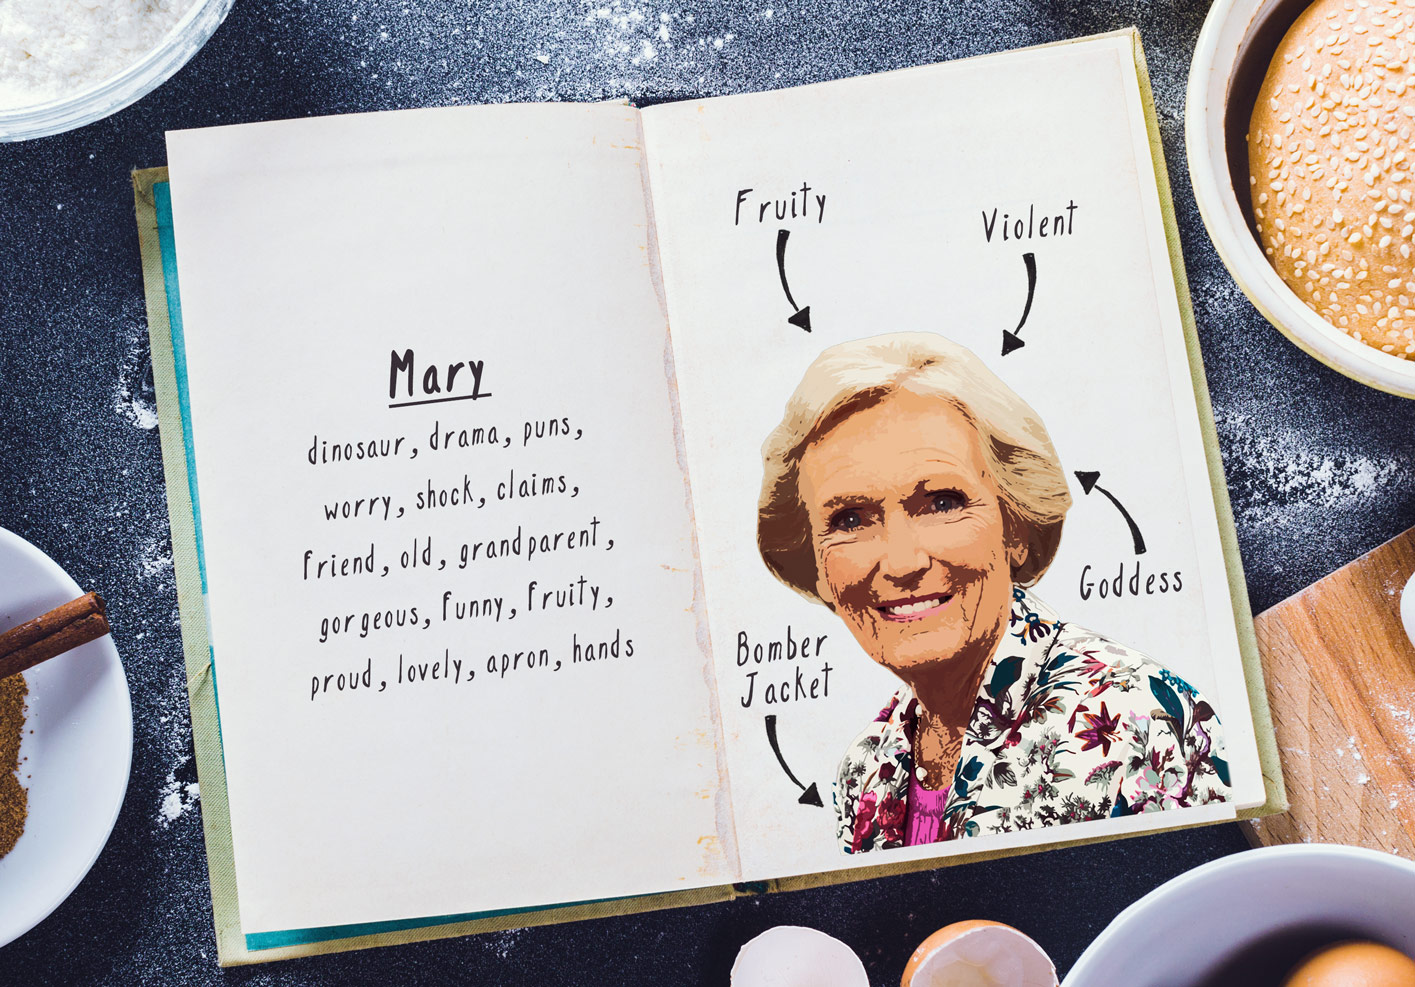 gbbo_book_mary